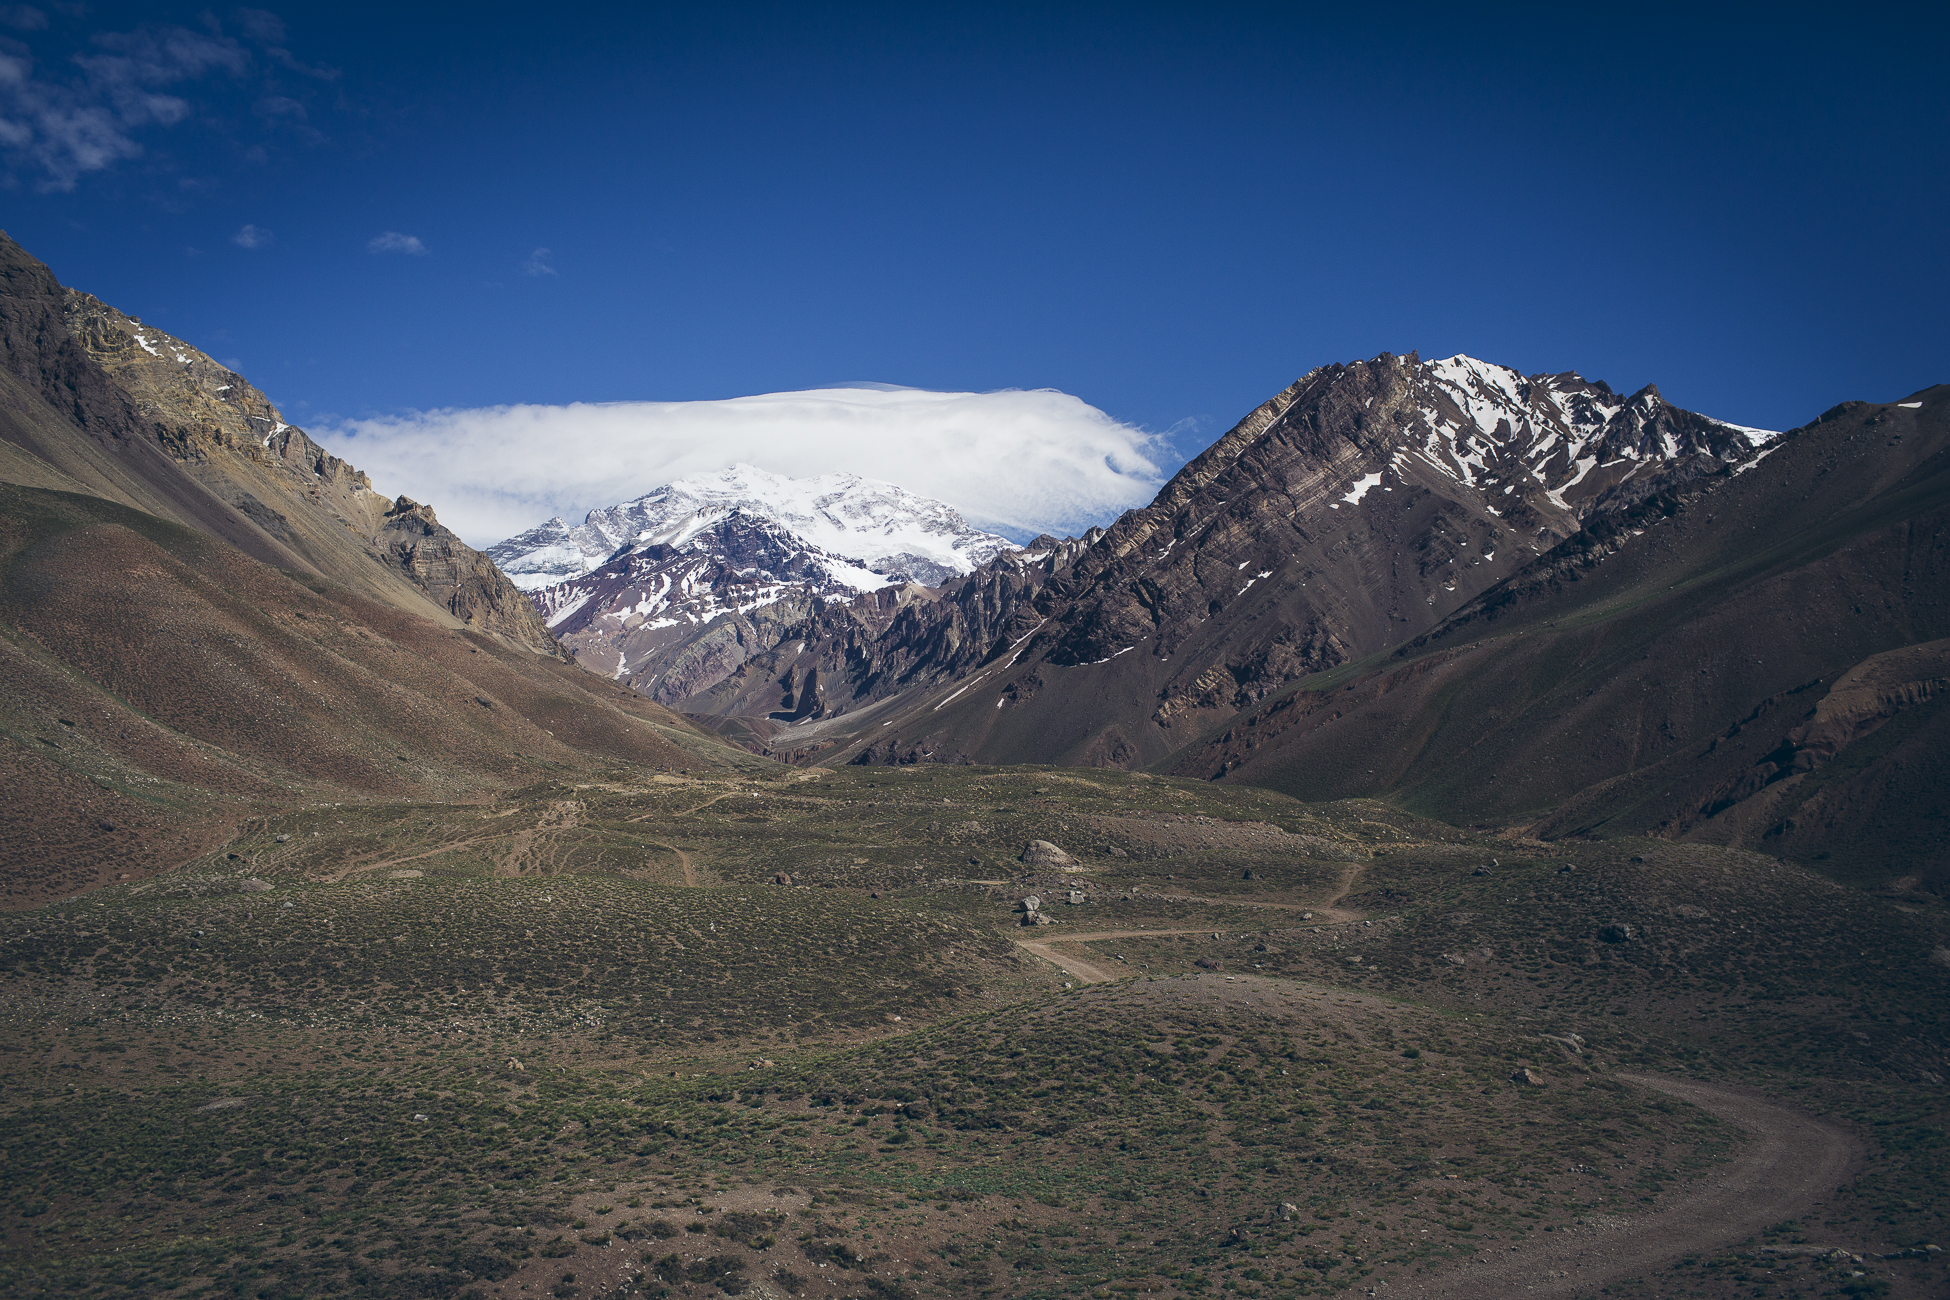 desktoglory_northern_argentina-117